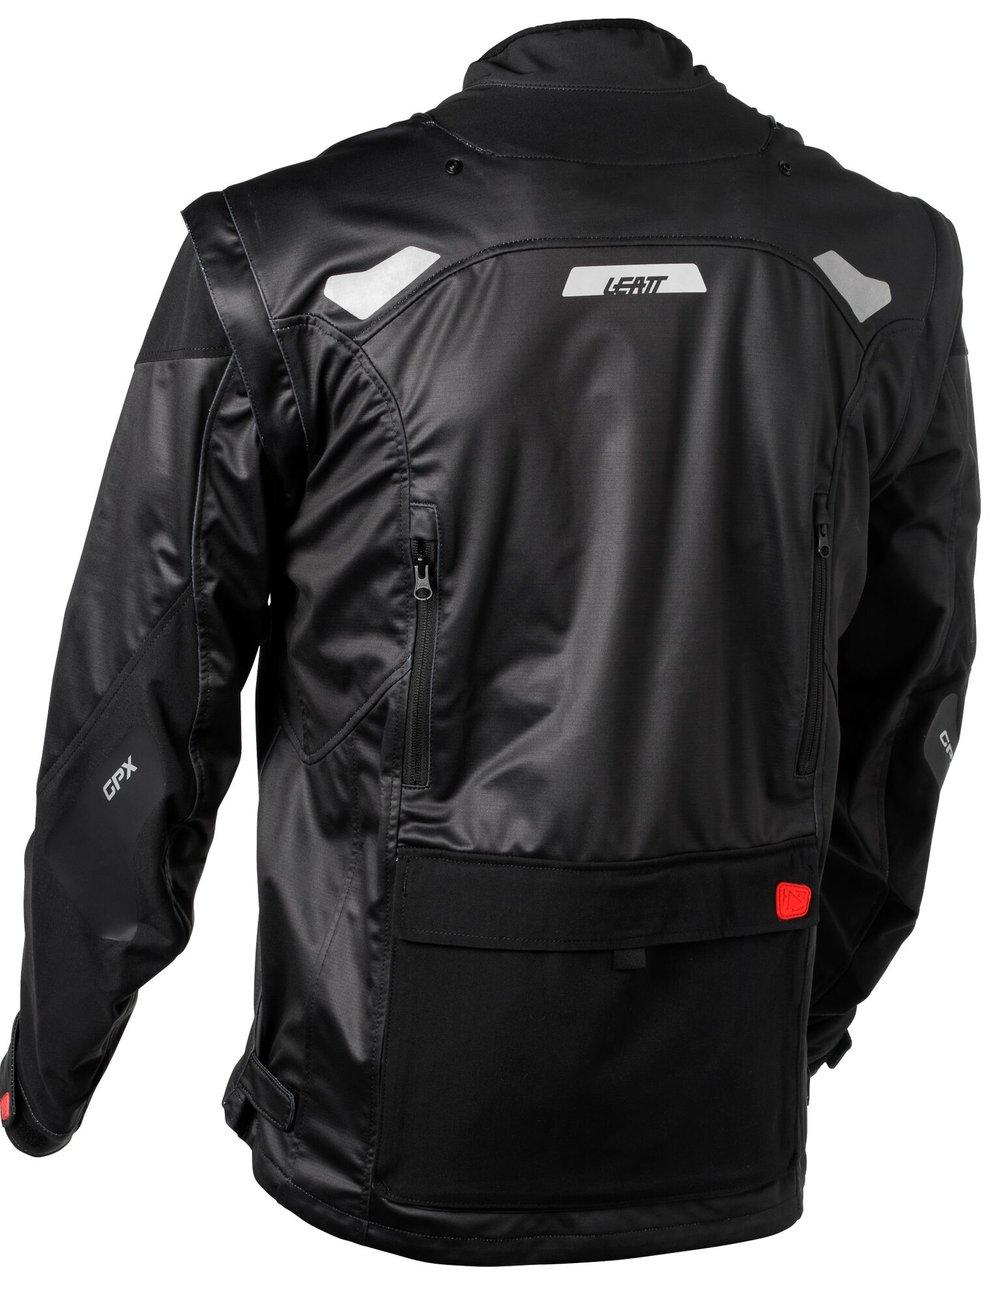 Jacket GPX 4.5 Lite Black Grey 2018_1.JPG